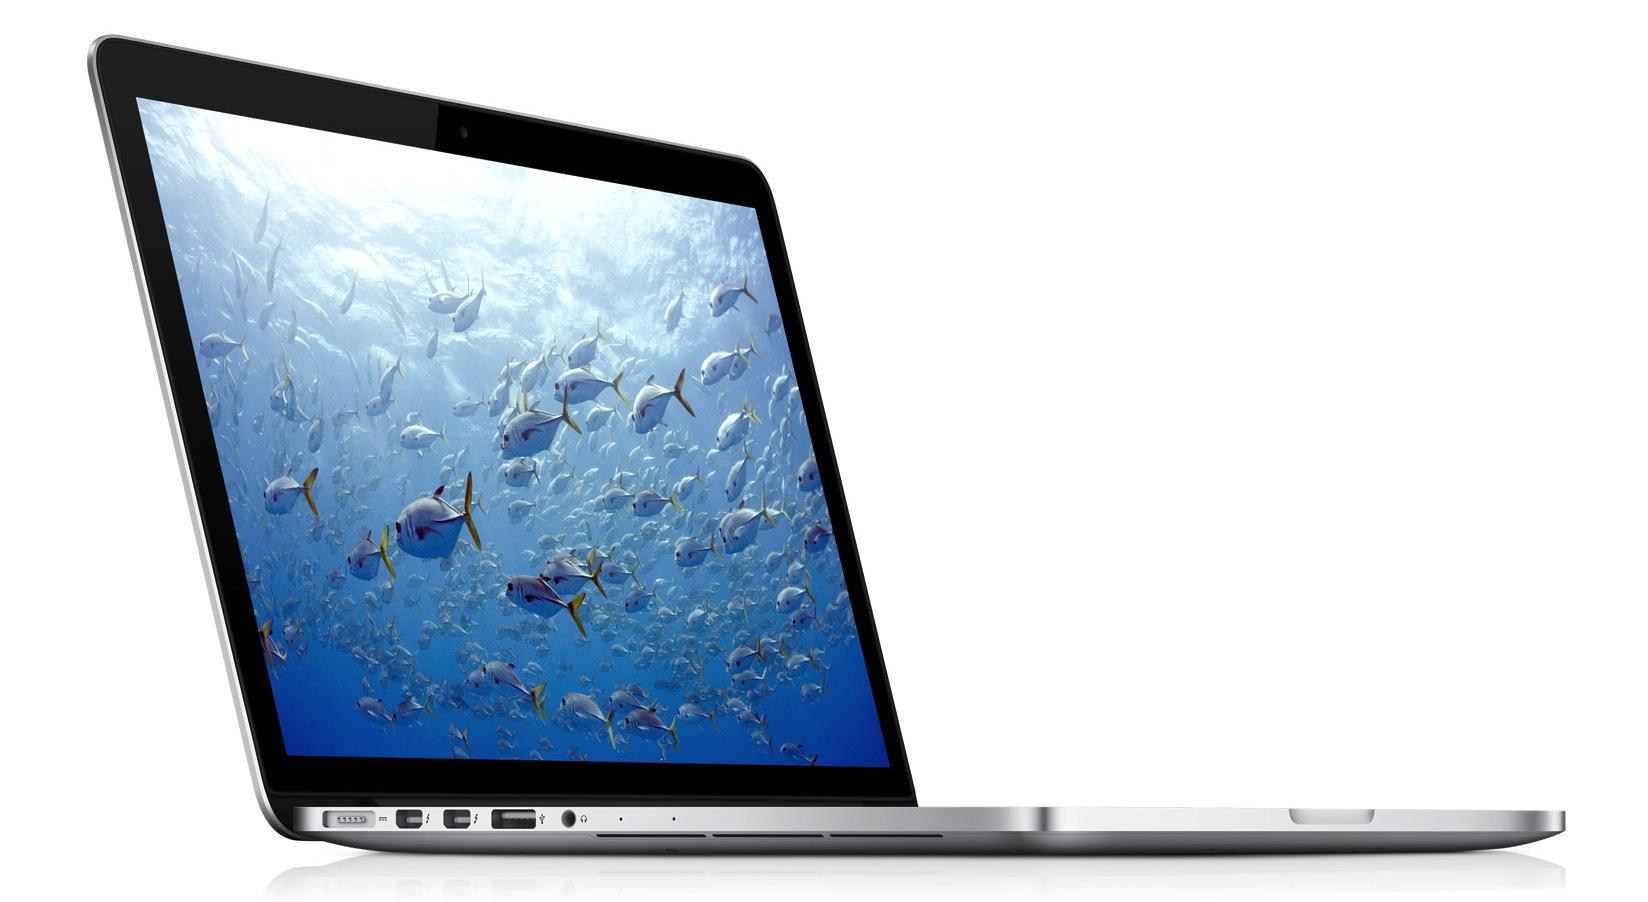 20130104 Macbook-Pro-13-inch-Retina